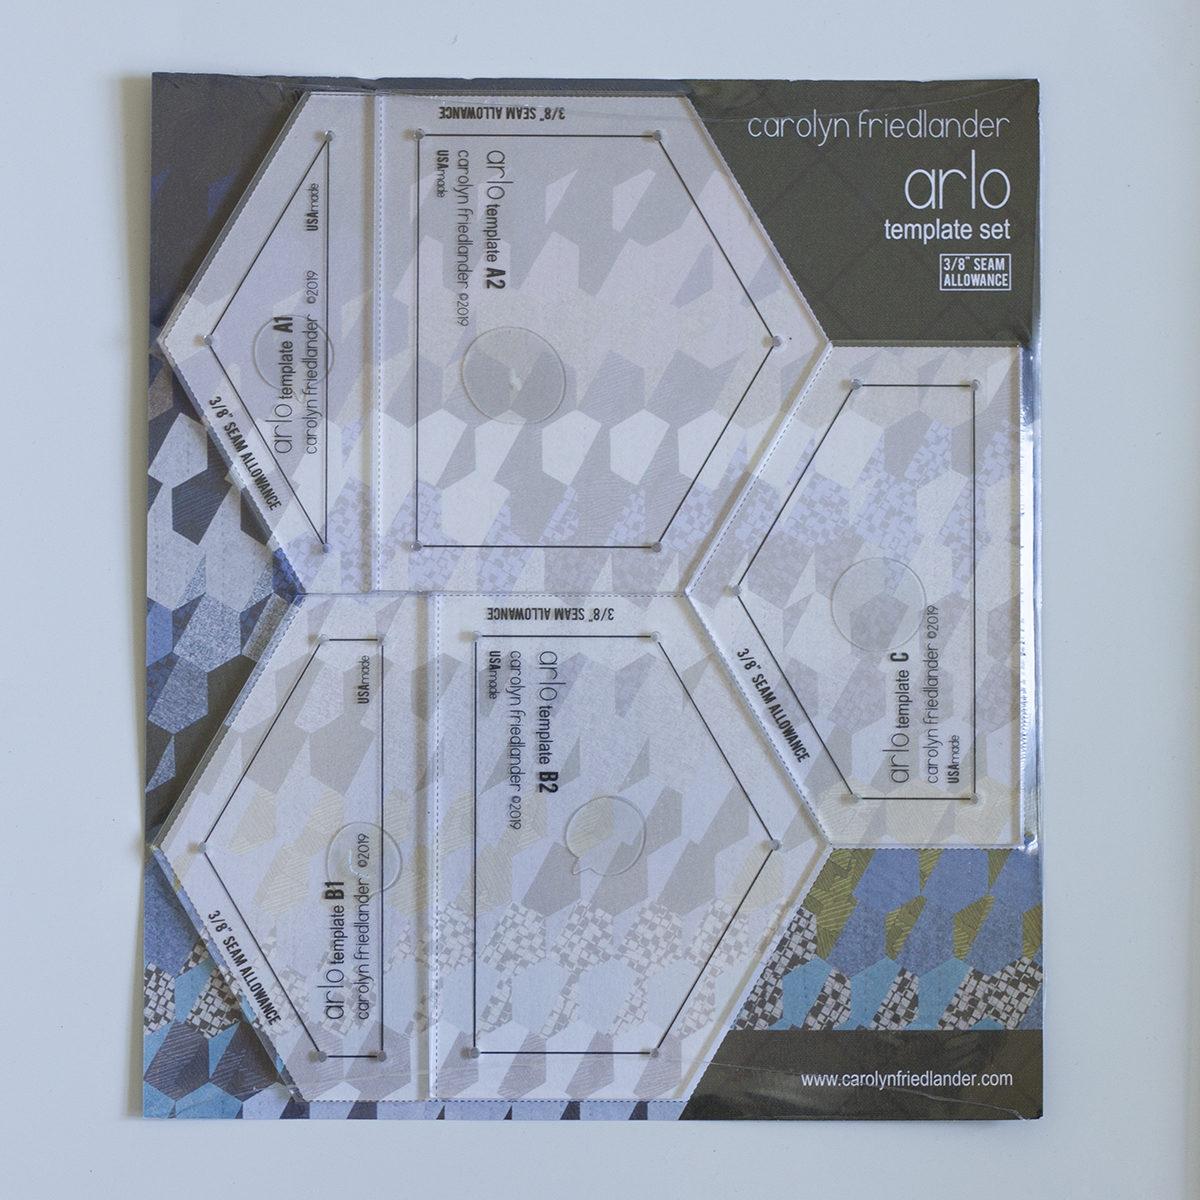 Arlo Acrylic Template Set 3/8